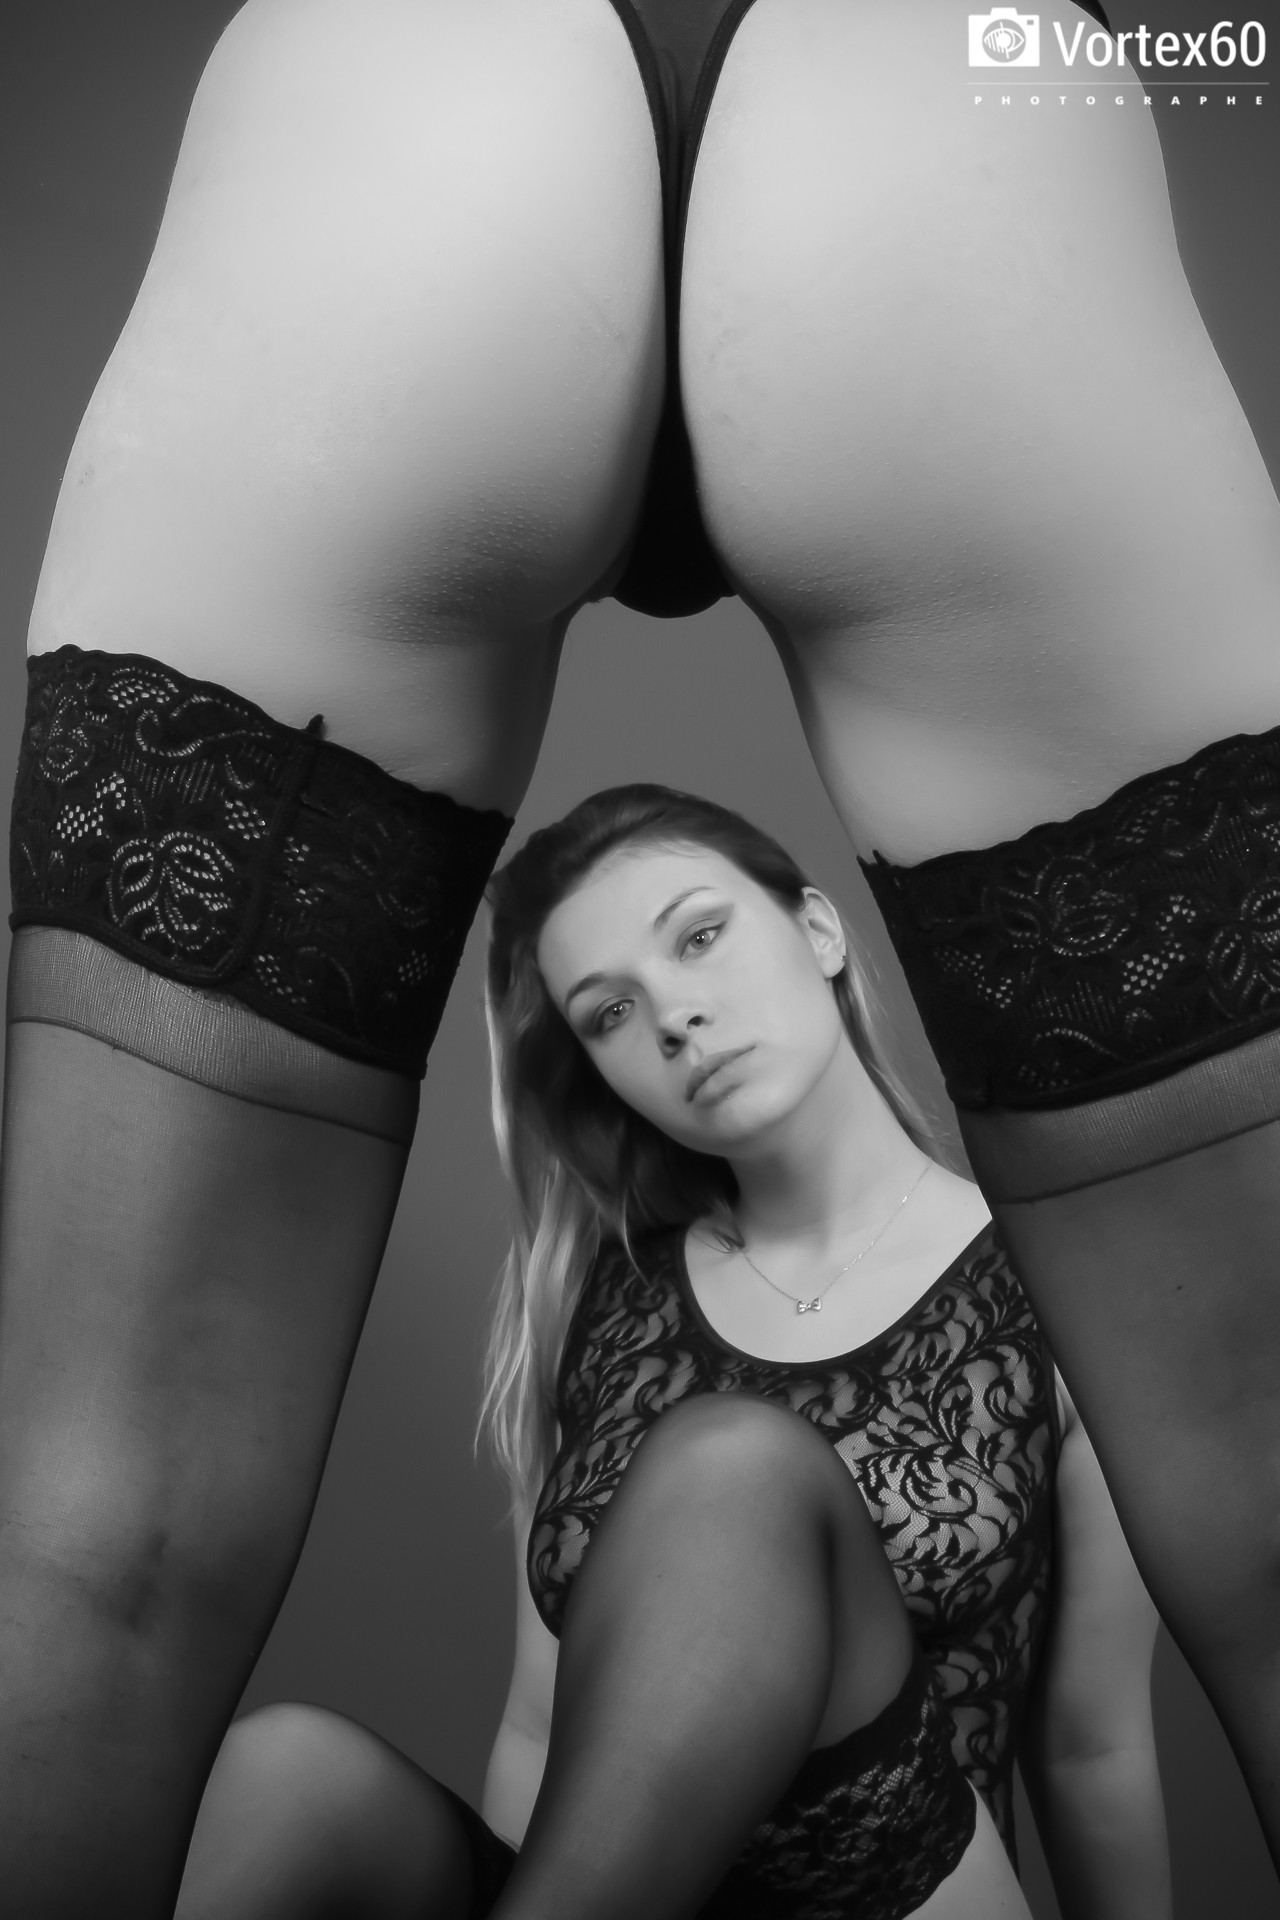 Duo - Audrey By Vortex60 photographe